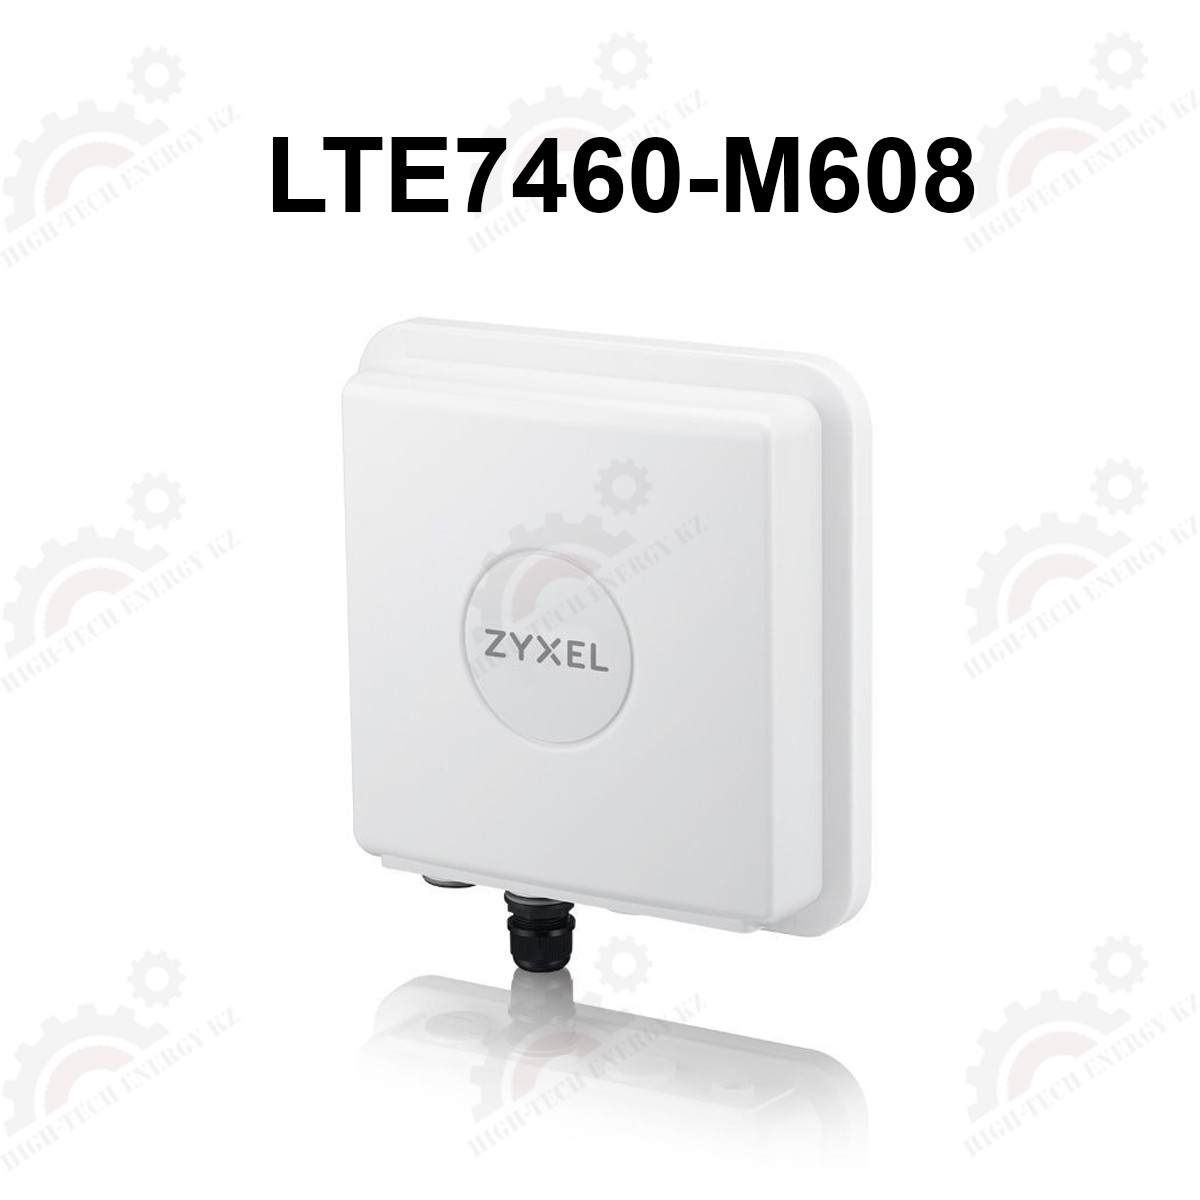 Уличный LTE маршрутизтор Zyxel LTE7460-M608